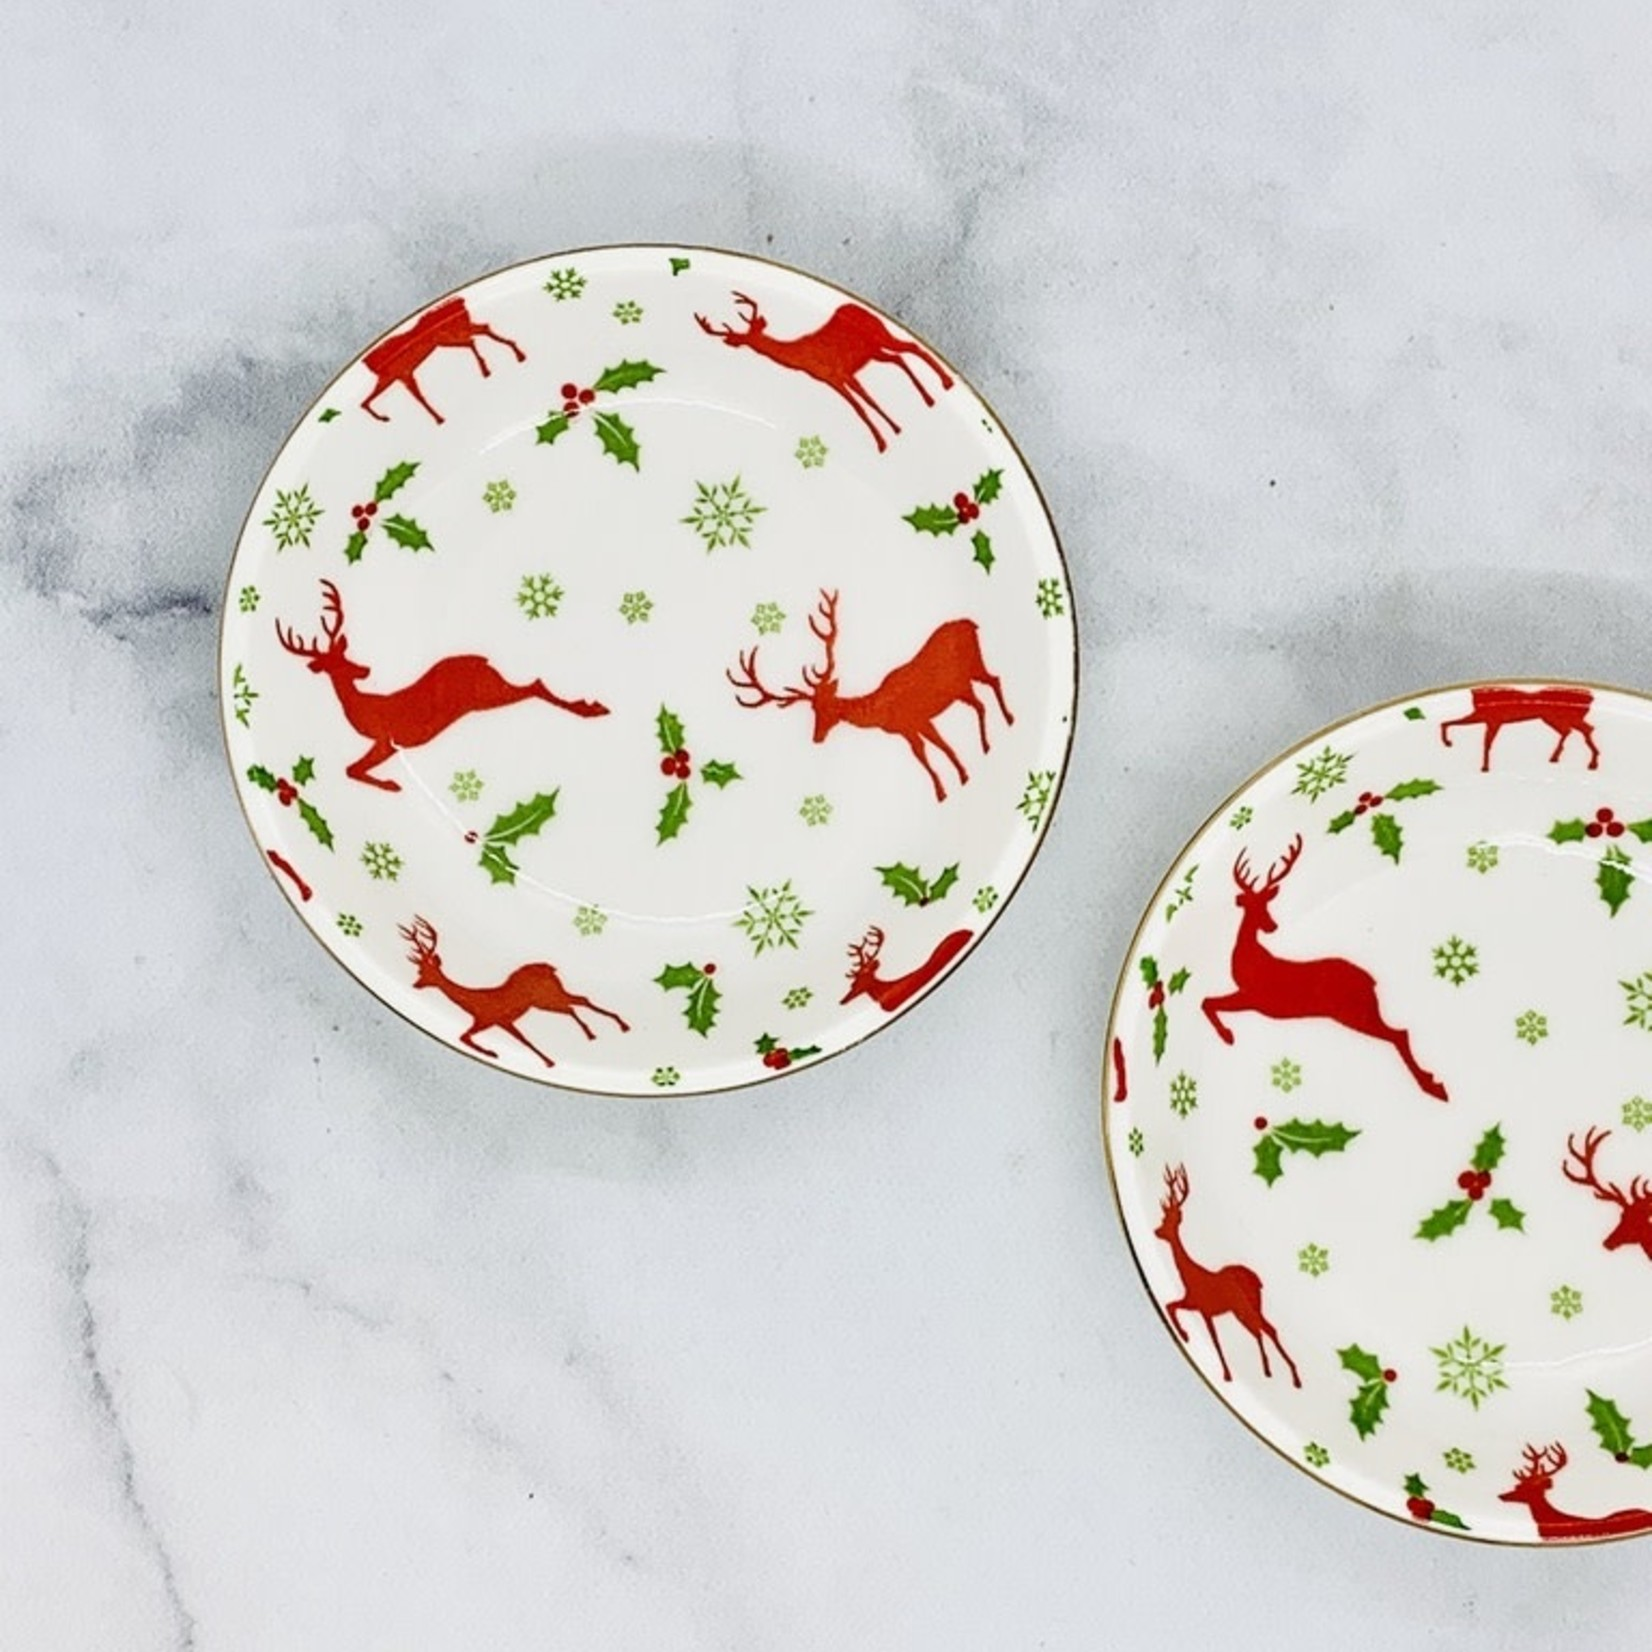 "3-3/4"" Round Stoneware Dish w/ Deer"